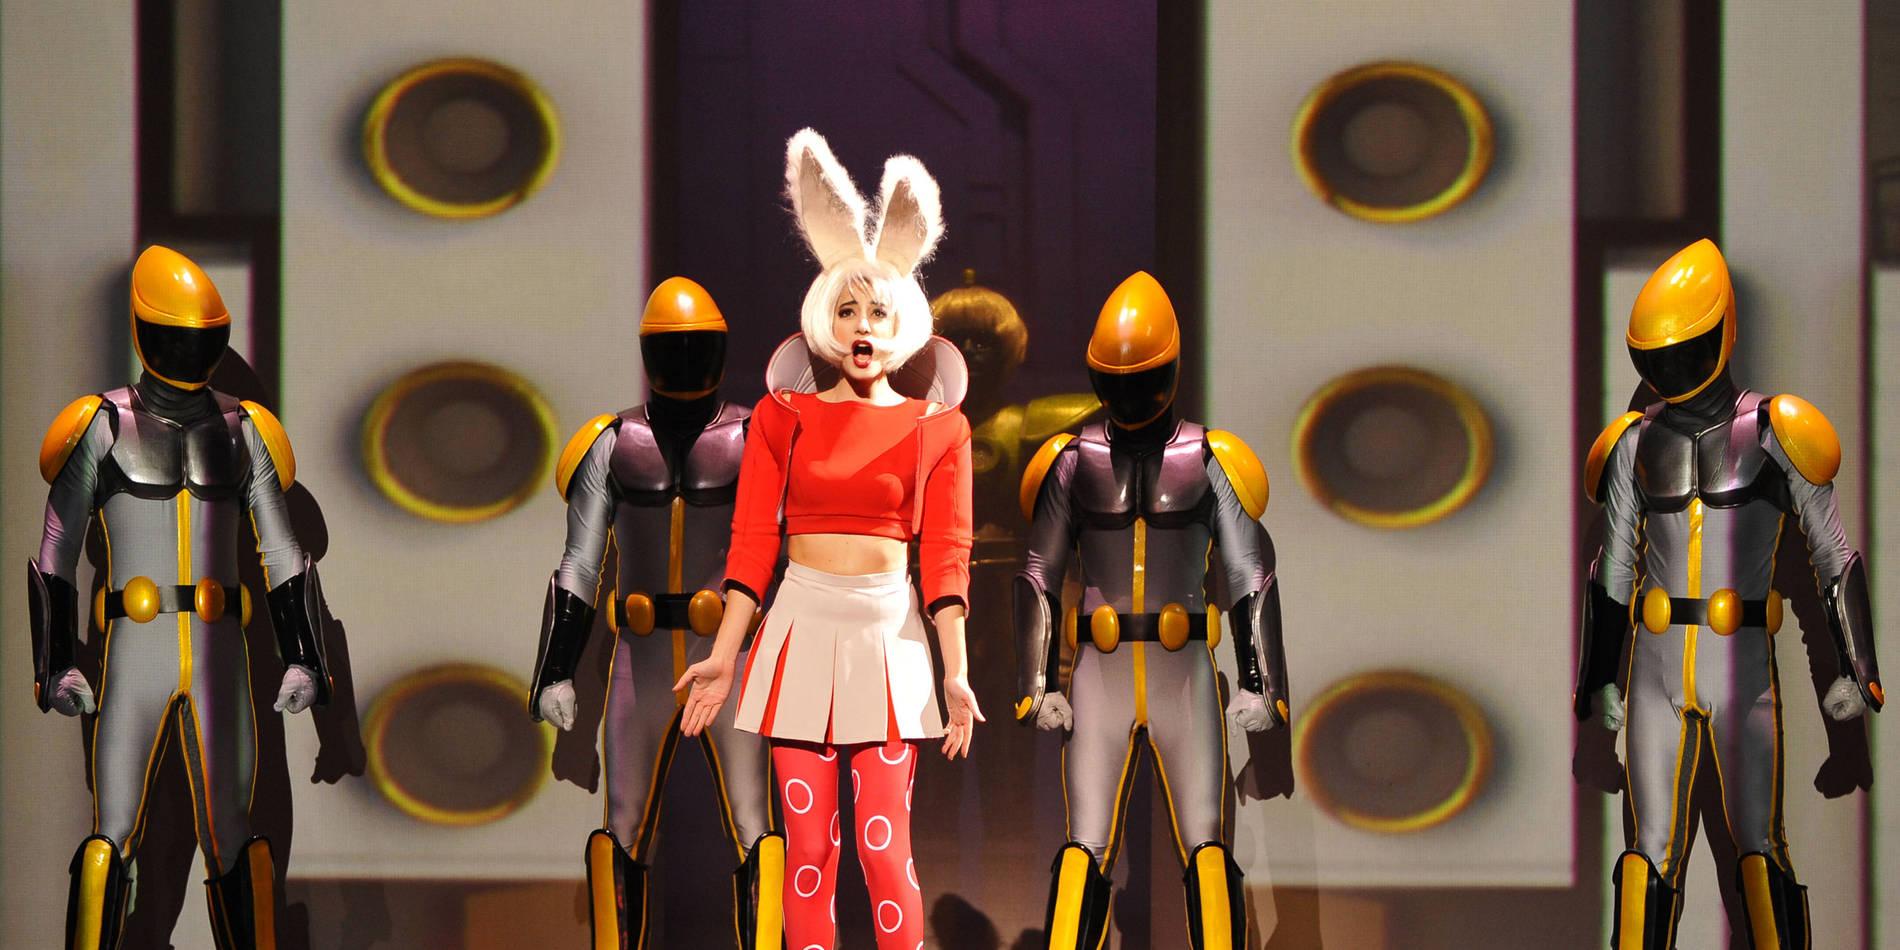 ·: Nicolas Buffe :· - Elisa (Raquel Camarinha) Théâtre du Châtelet (c)Marie-Noêlle Robert 3k